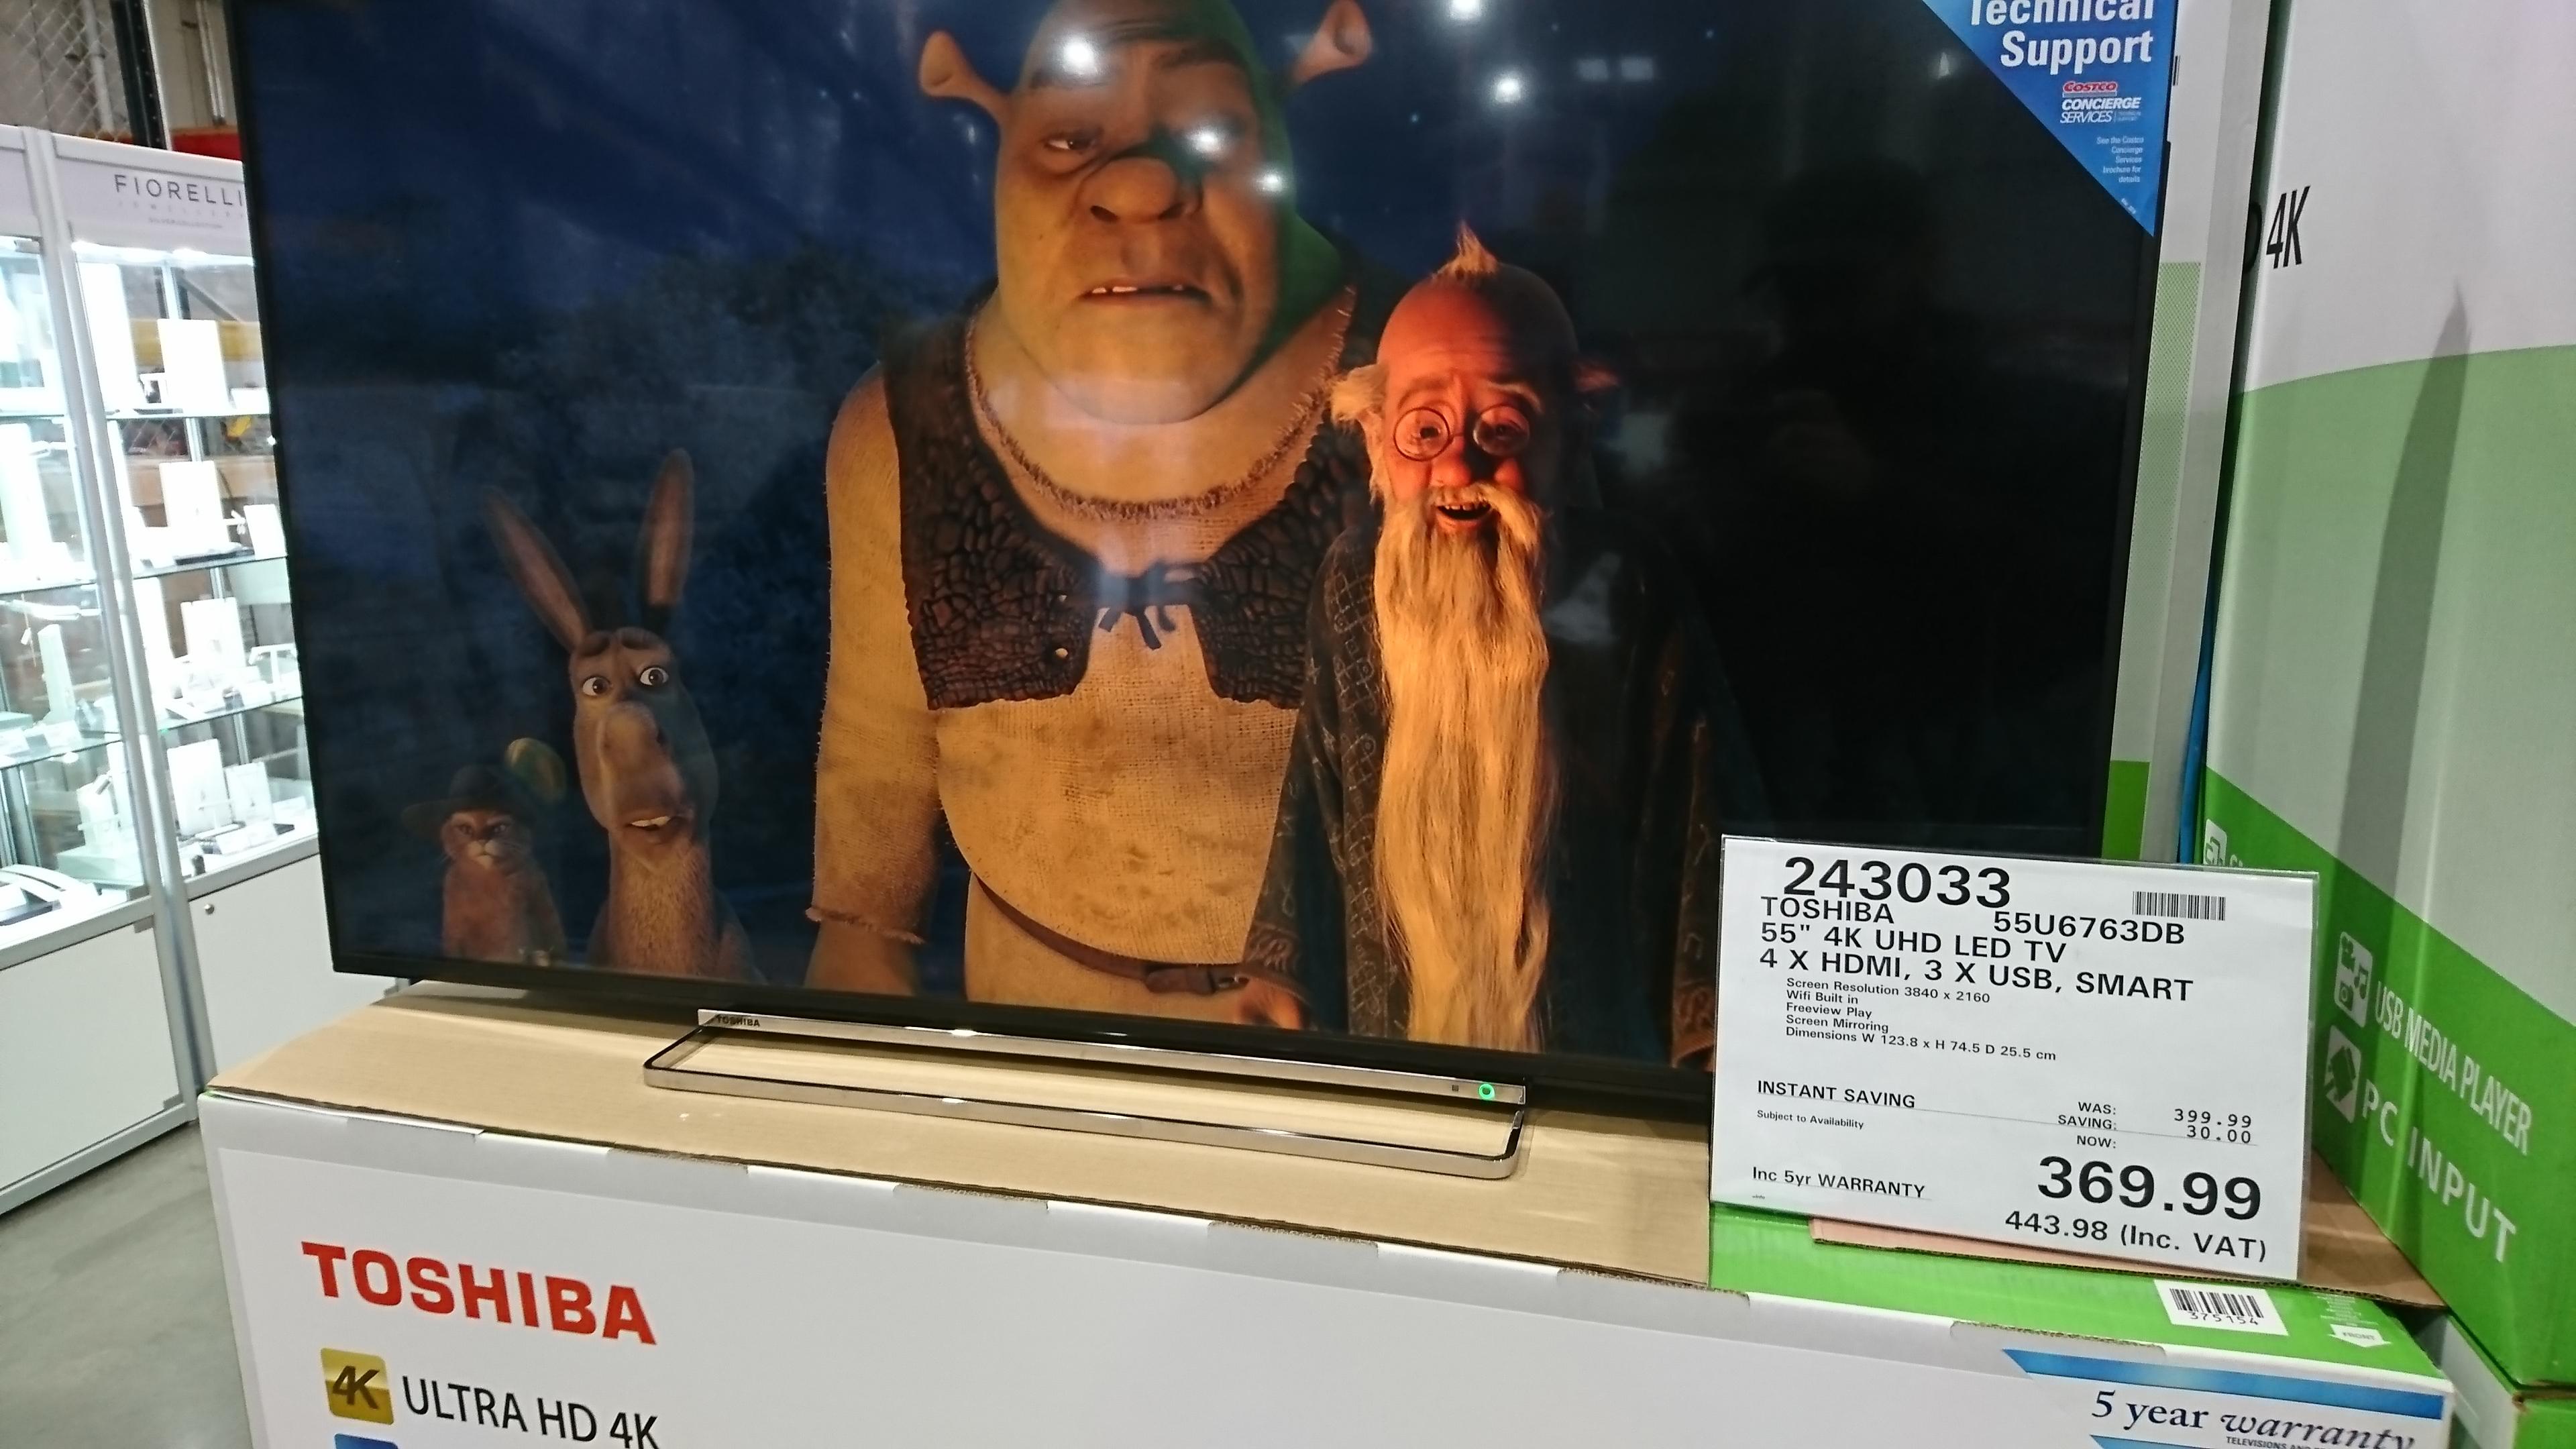 Toshiba 55 inch 4k uhd led - £443.98 @ Costco